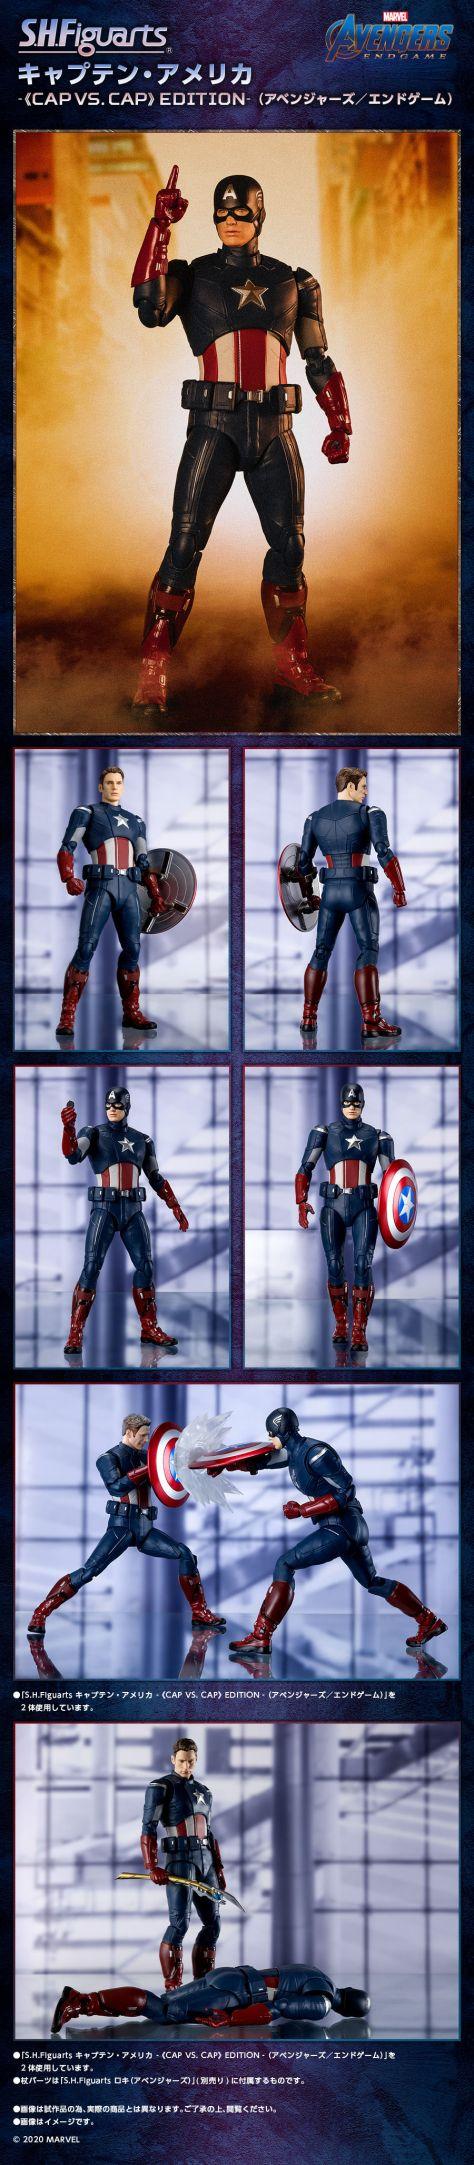 First-Look-Captain-America-Avengers-Avengers-Endgame-SHFiguarts-Bandai-Tamashii